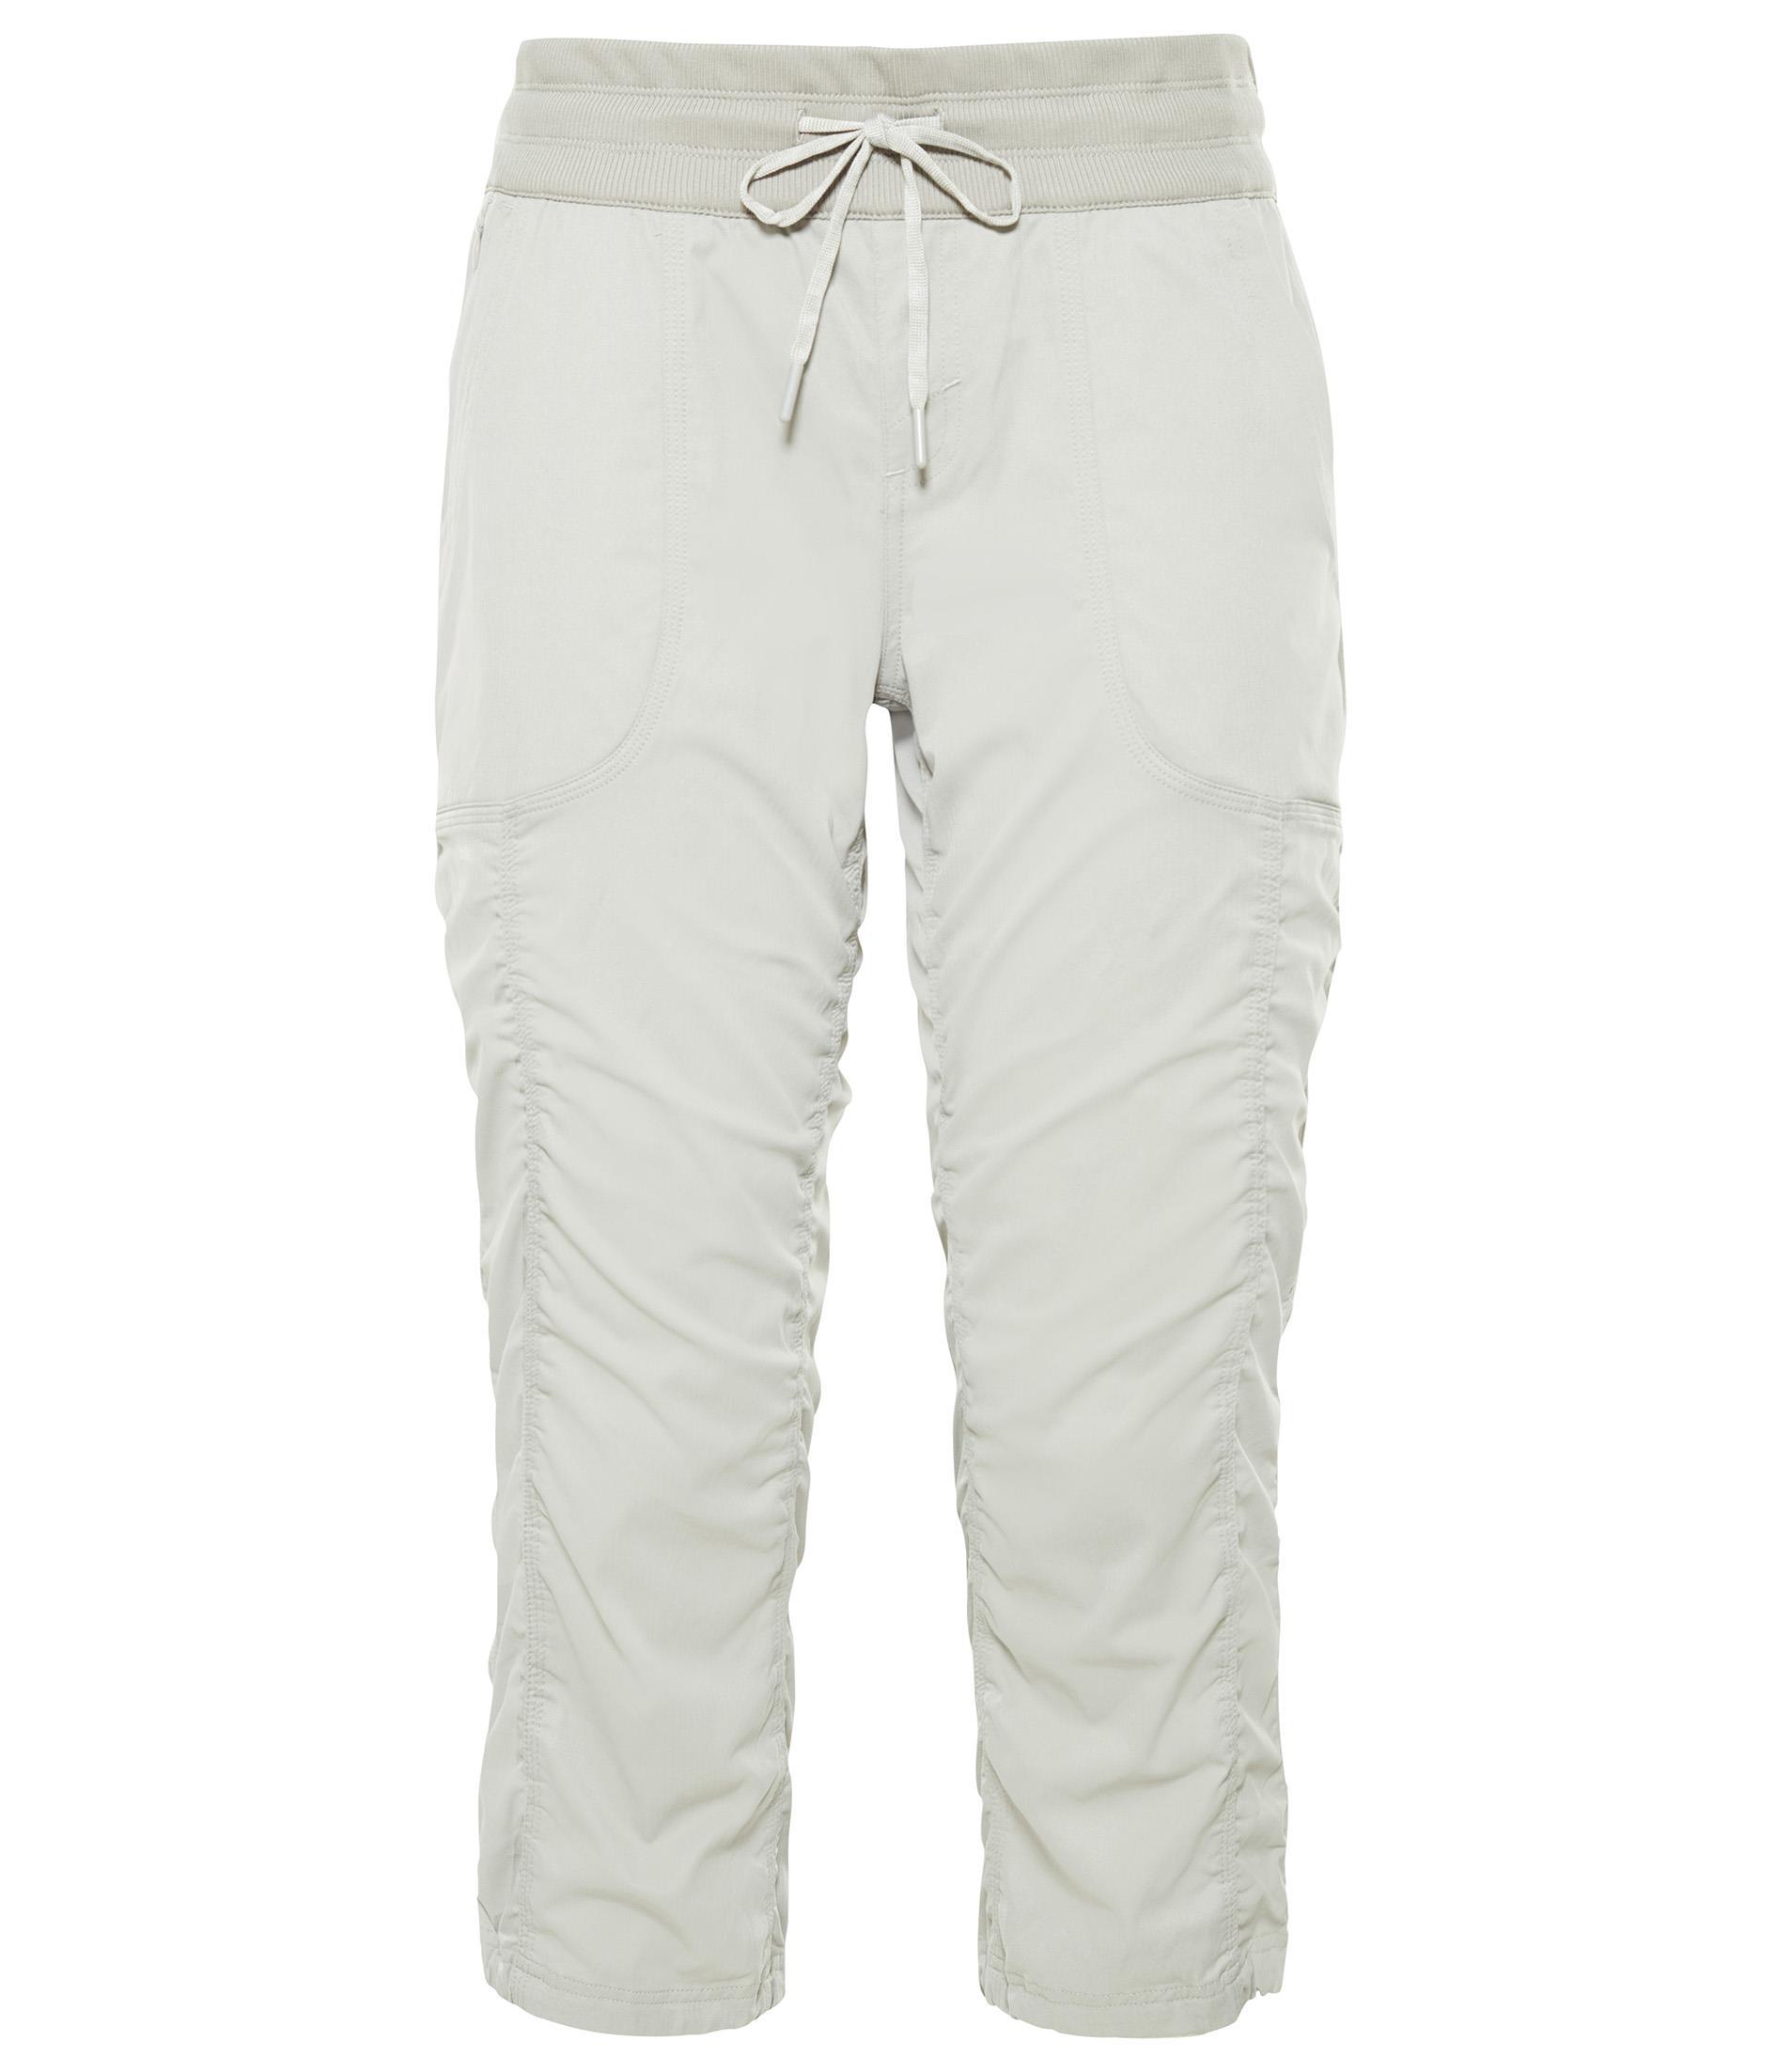 The Northface Kadın Aphrodite 2.0 Capri T92Uo6Ecs Pantolon